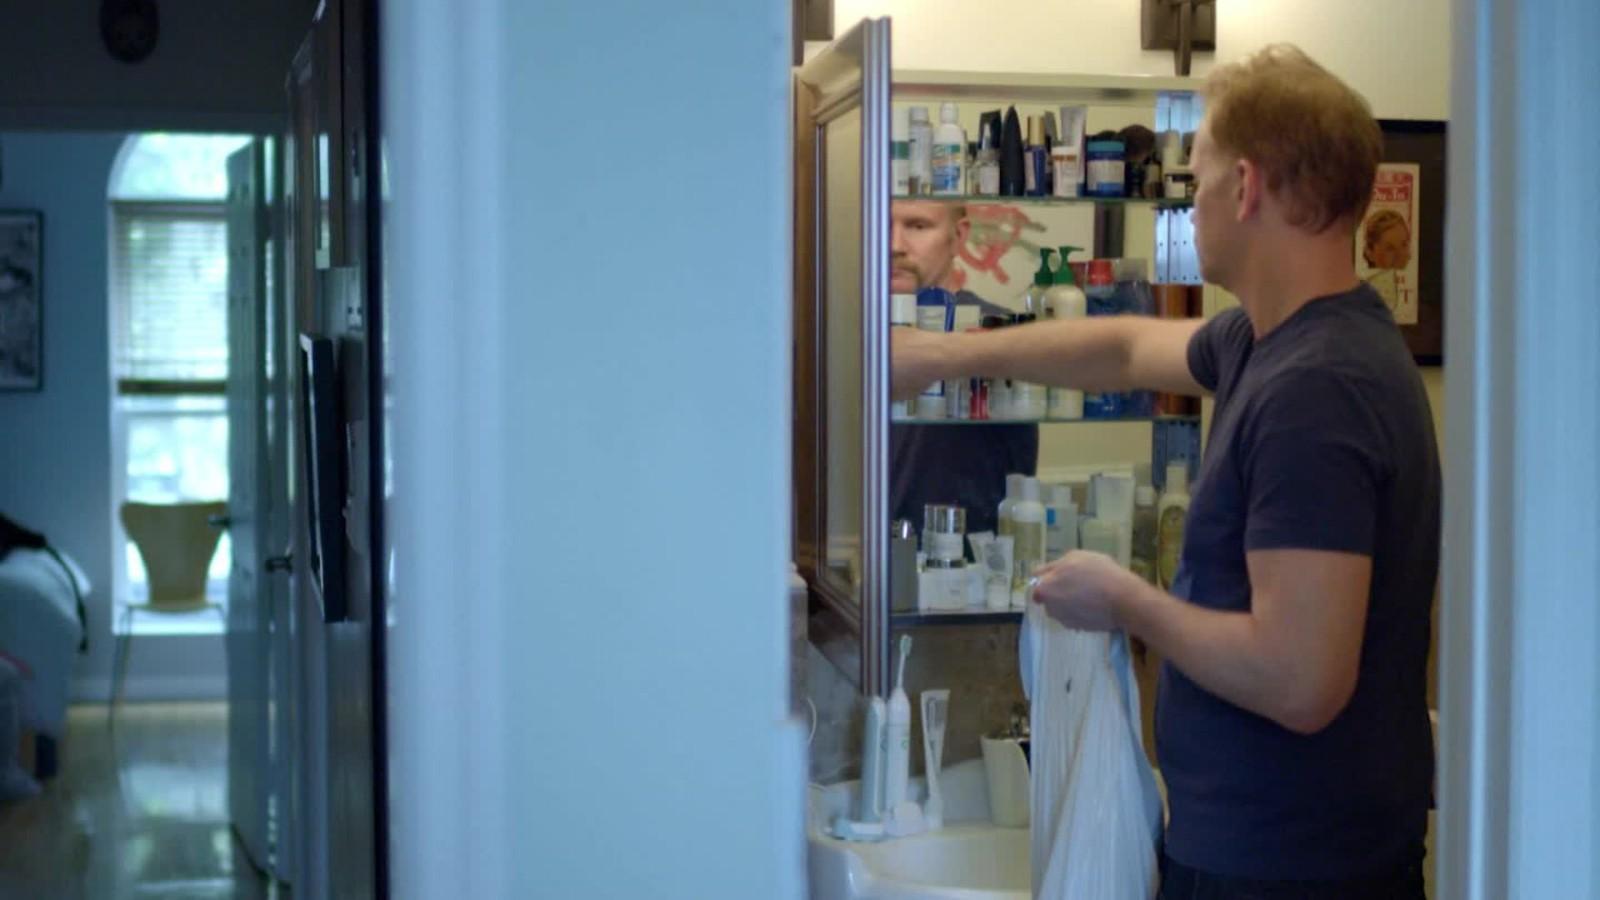 The detox challenge - CNN Video